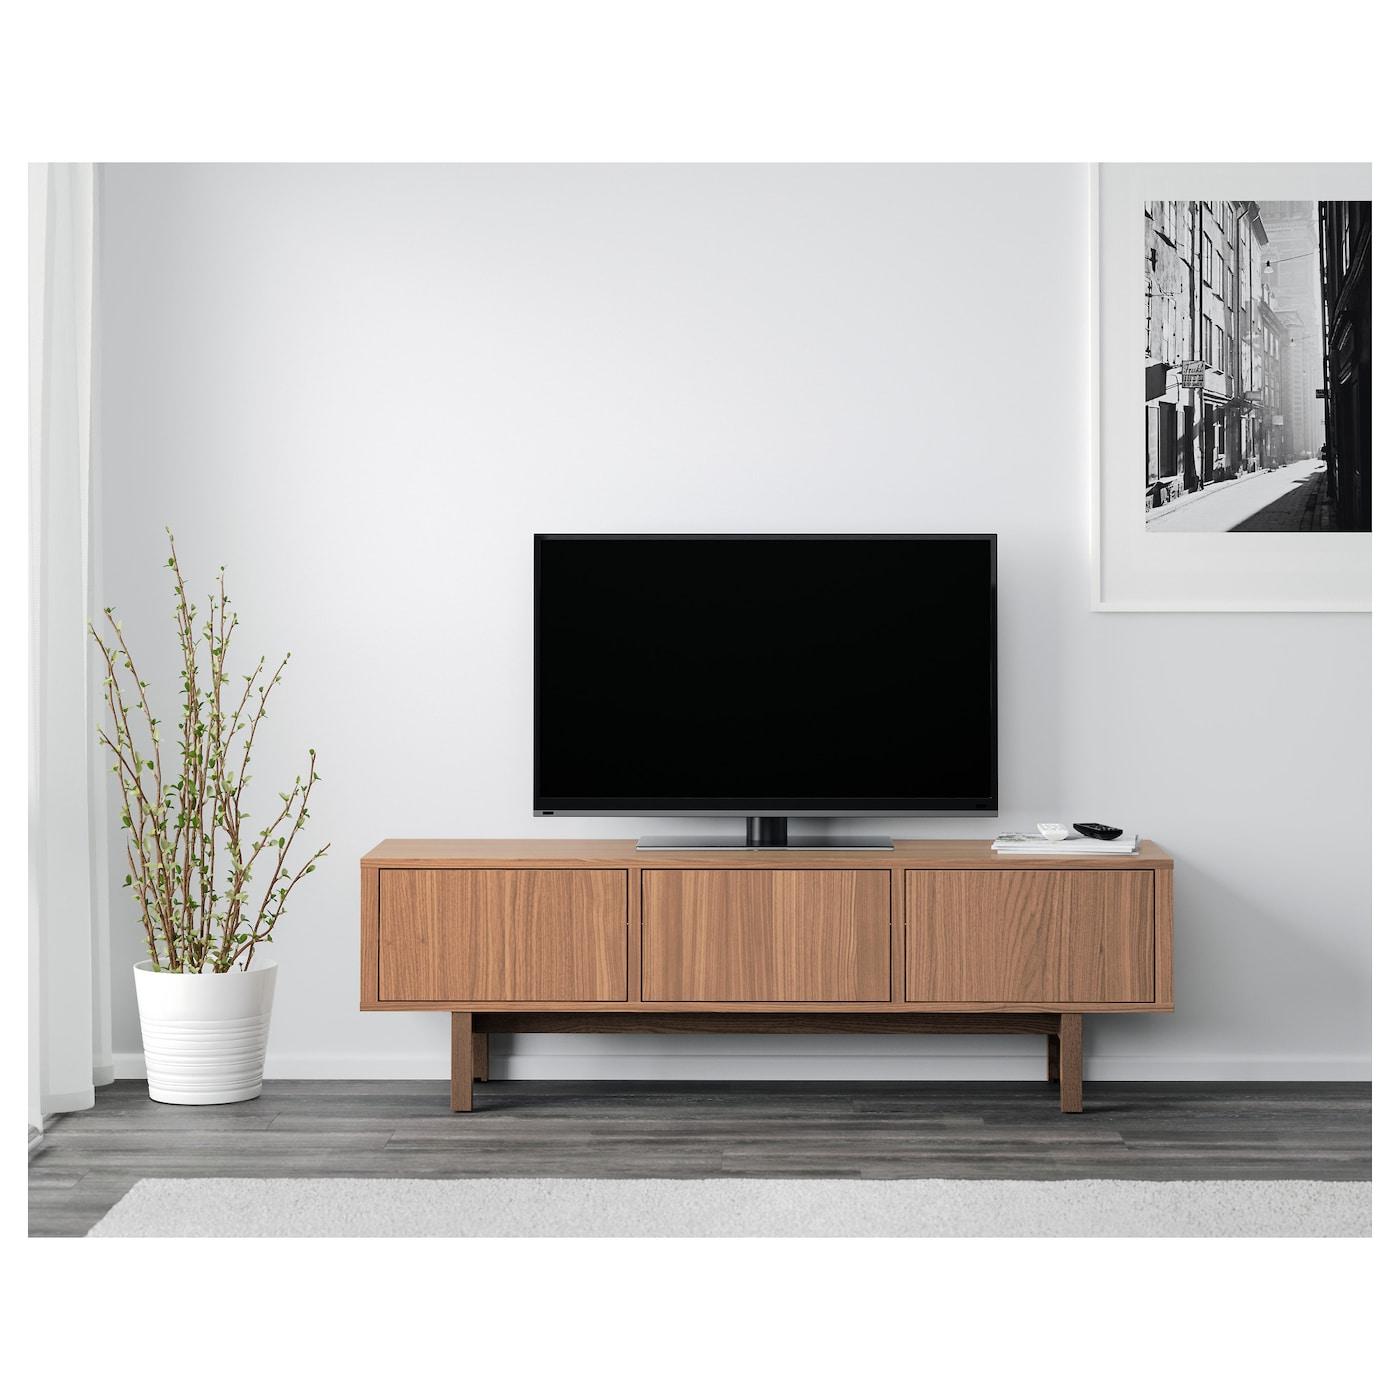 Stockholm mueble tv chapa nogal 160 x 40 x 50 cm ikea for Ikea mueble para tv